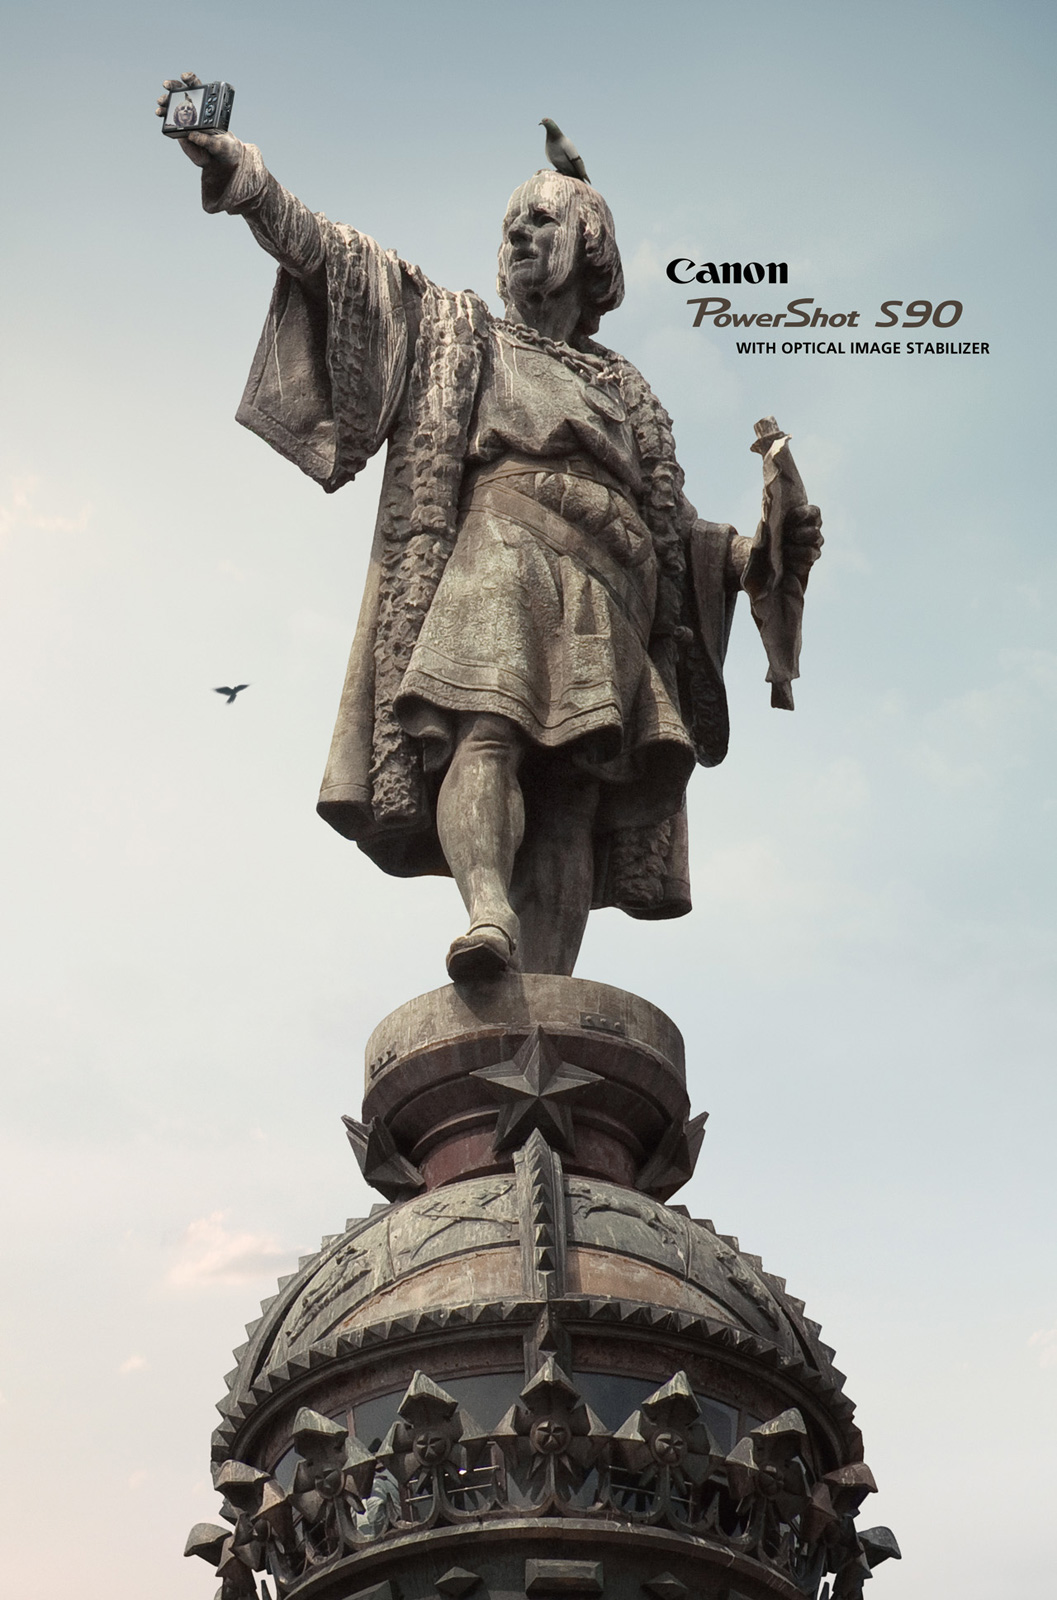 http://3.bp.blogspot.com/_42nL05s3A-8/TVBpRz0JlOI/AAAAAAAADhI/nU1tqkjgCJQ/s1600/Canon-Statues-colombus.jpg